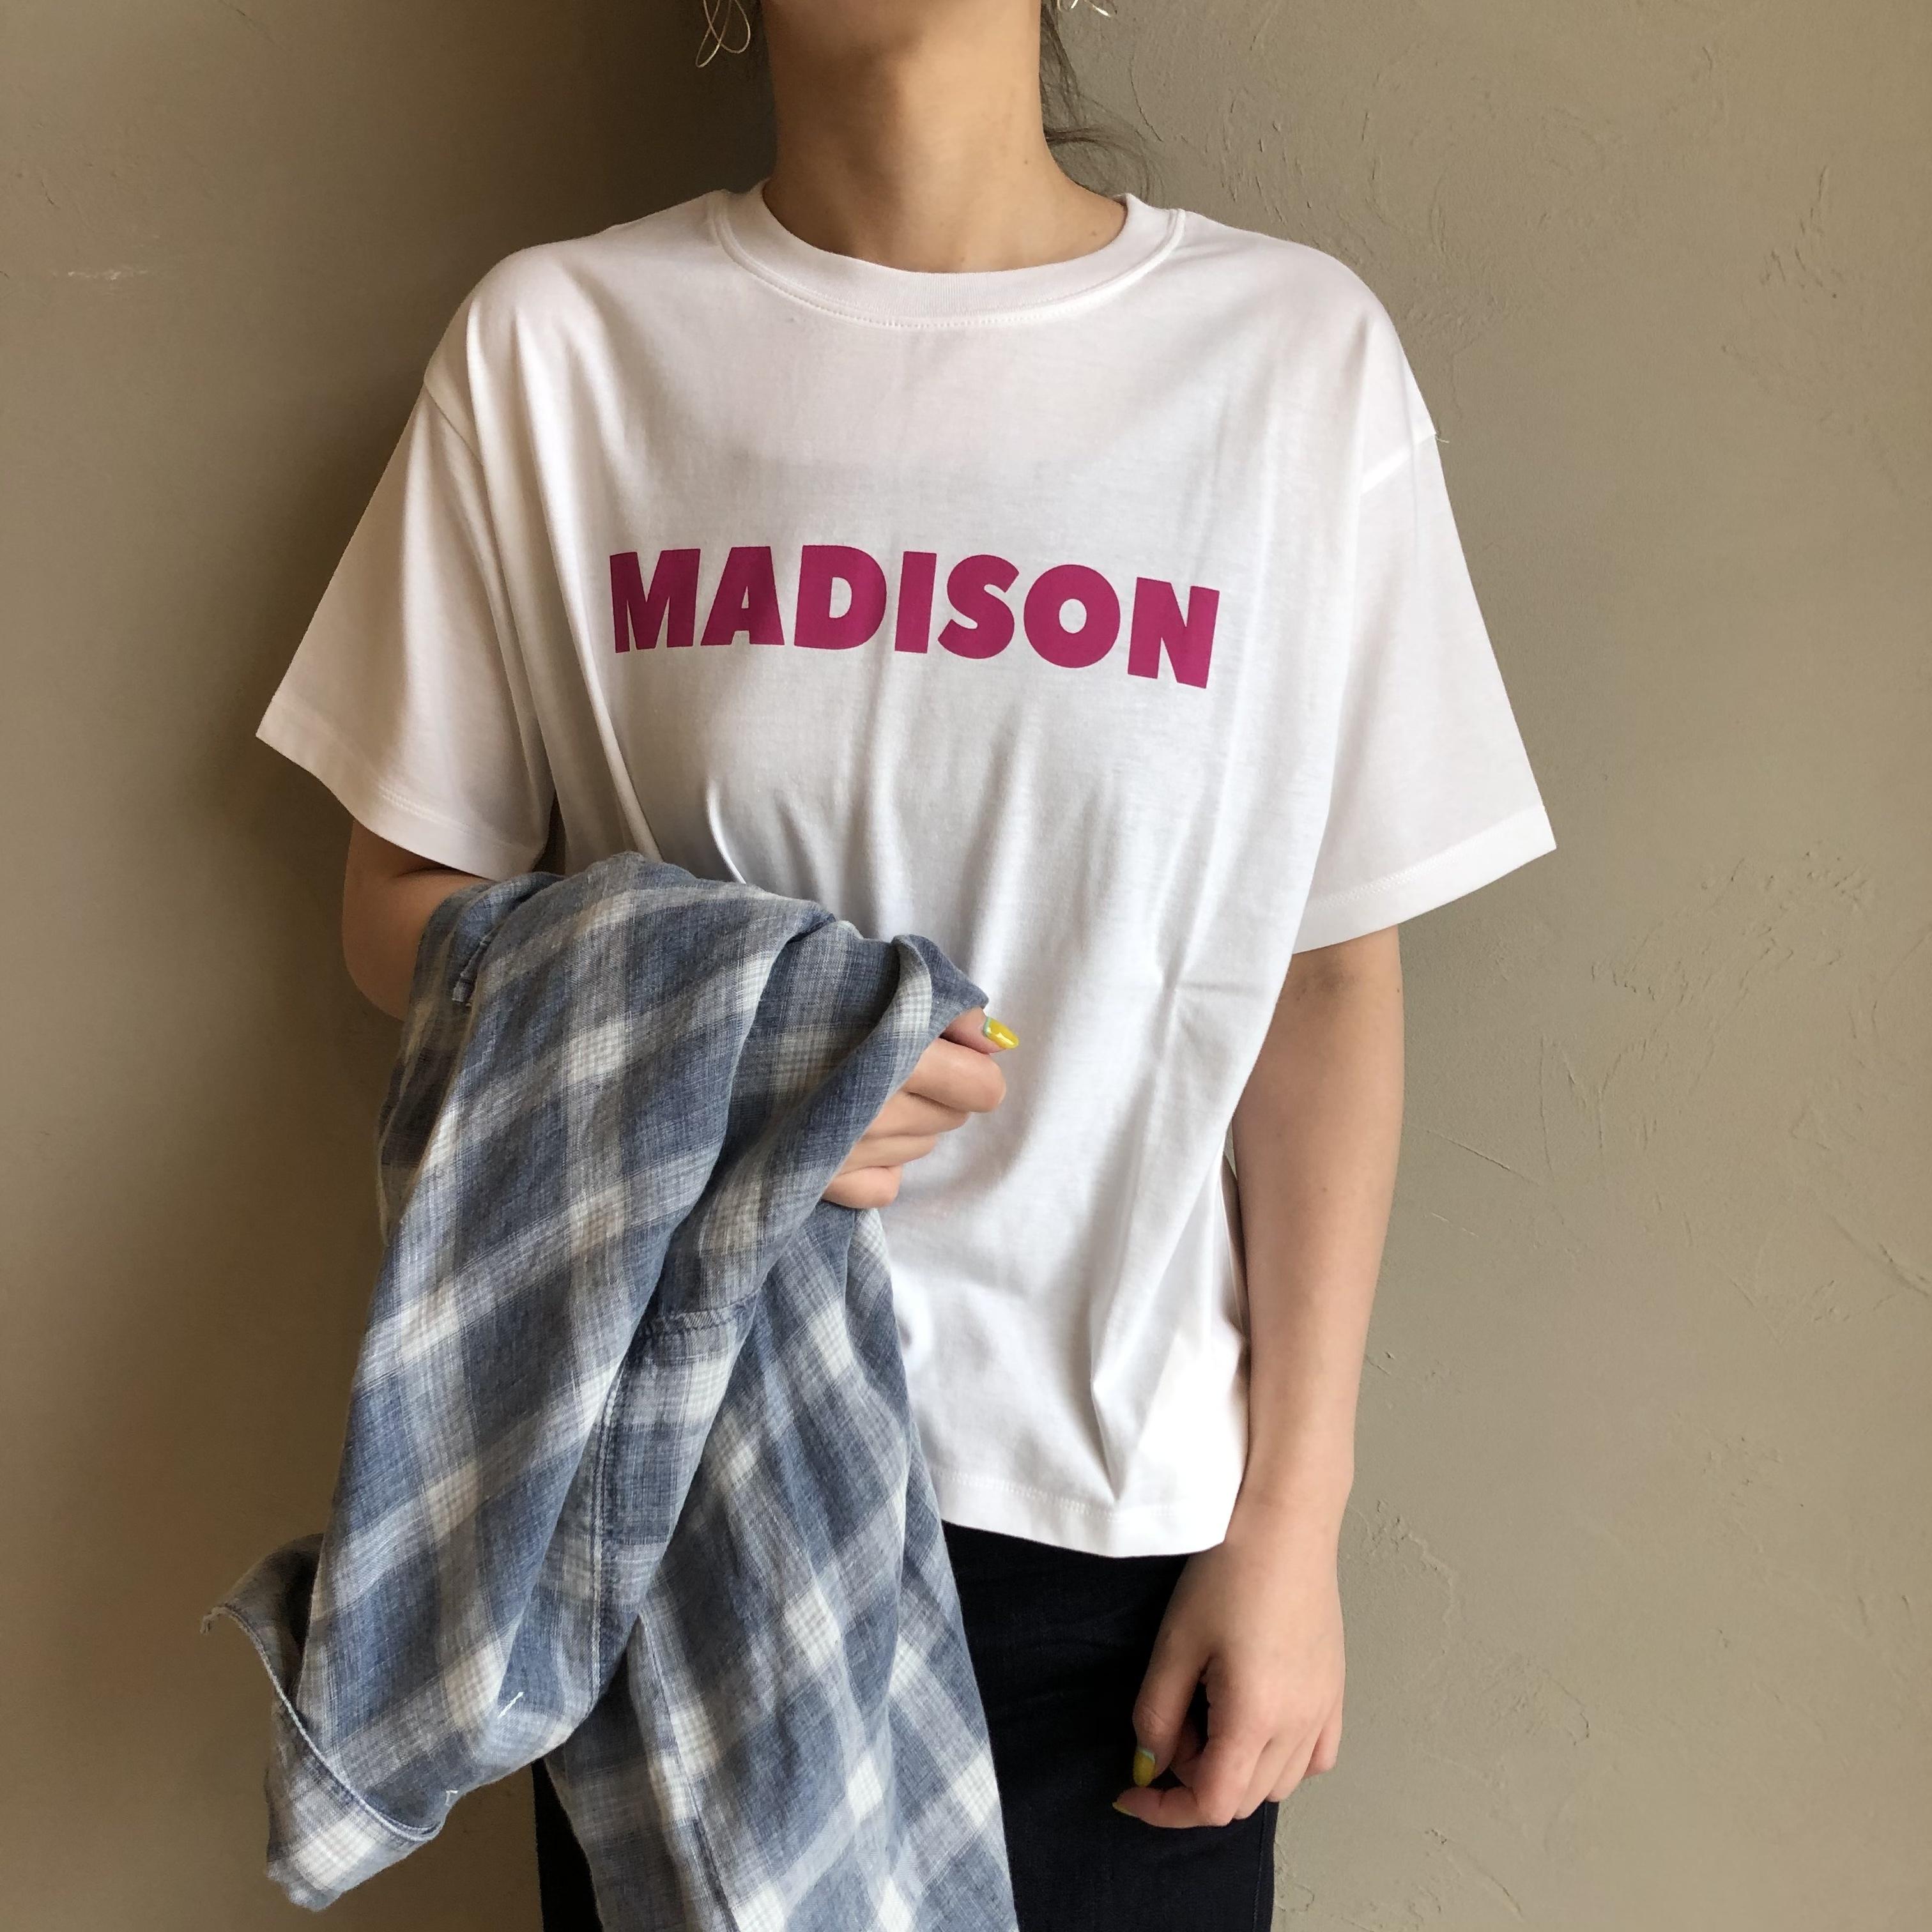 【 siro de labonte 】- R133202 - 30/- highgauge cotton MADISON Tシャツ